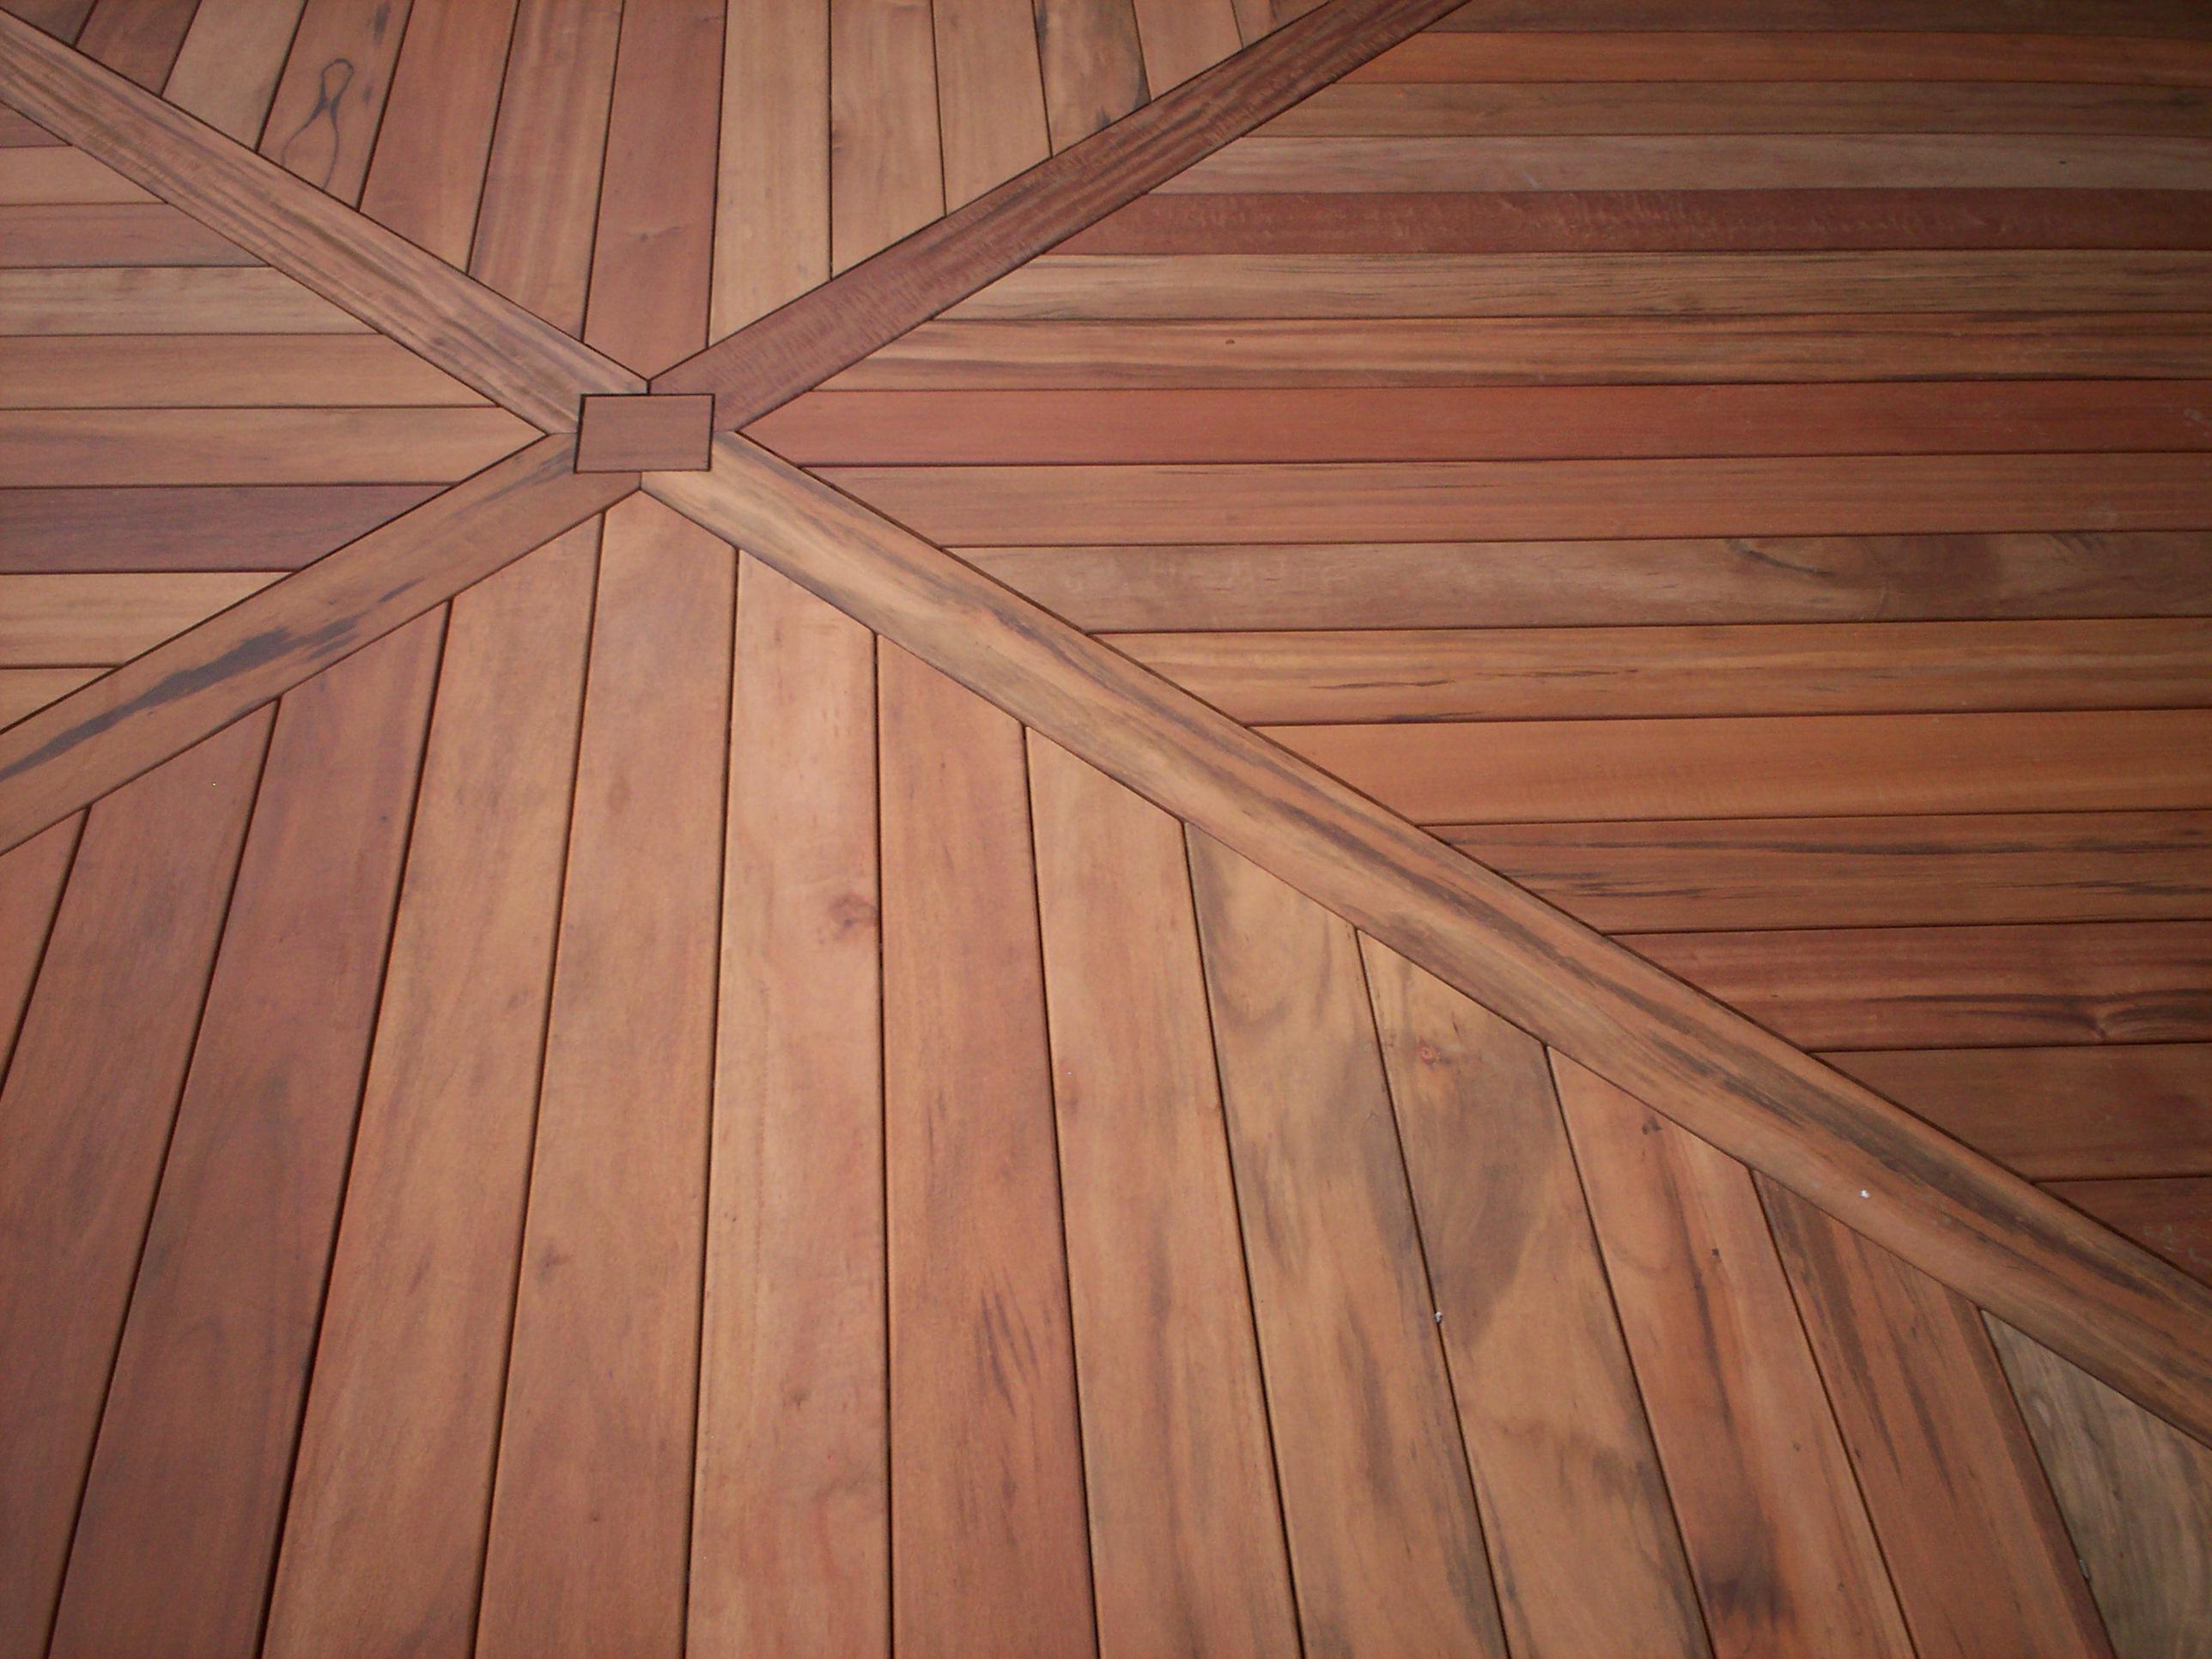 Deck Design Ideas Floor Board Patterns by Archadeck  St